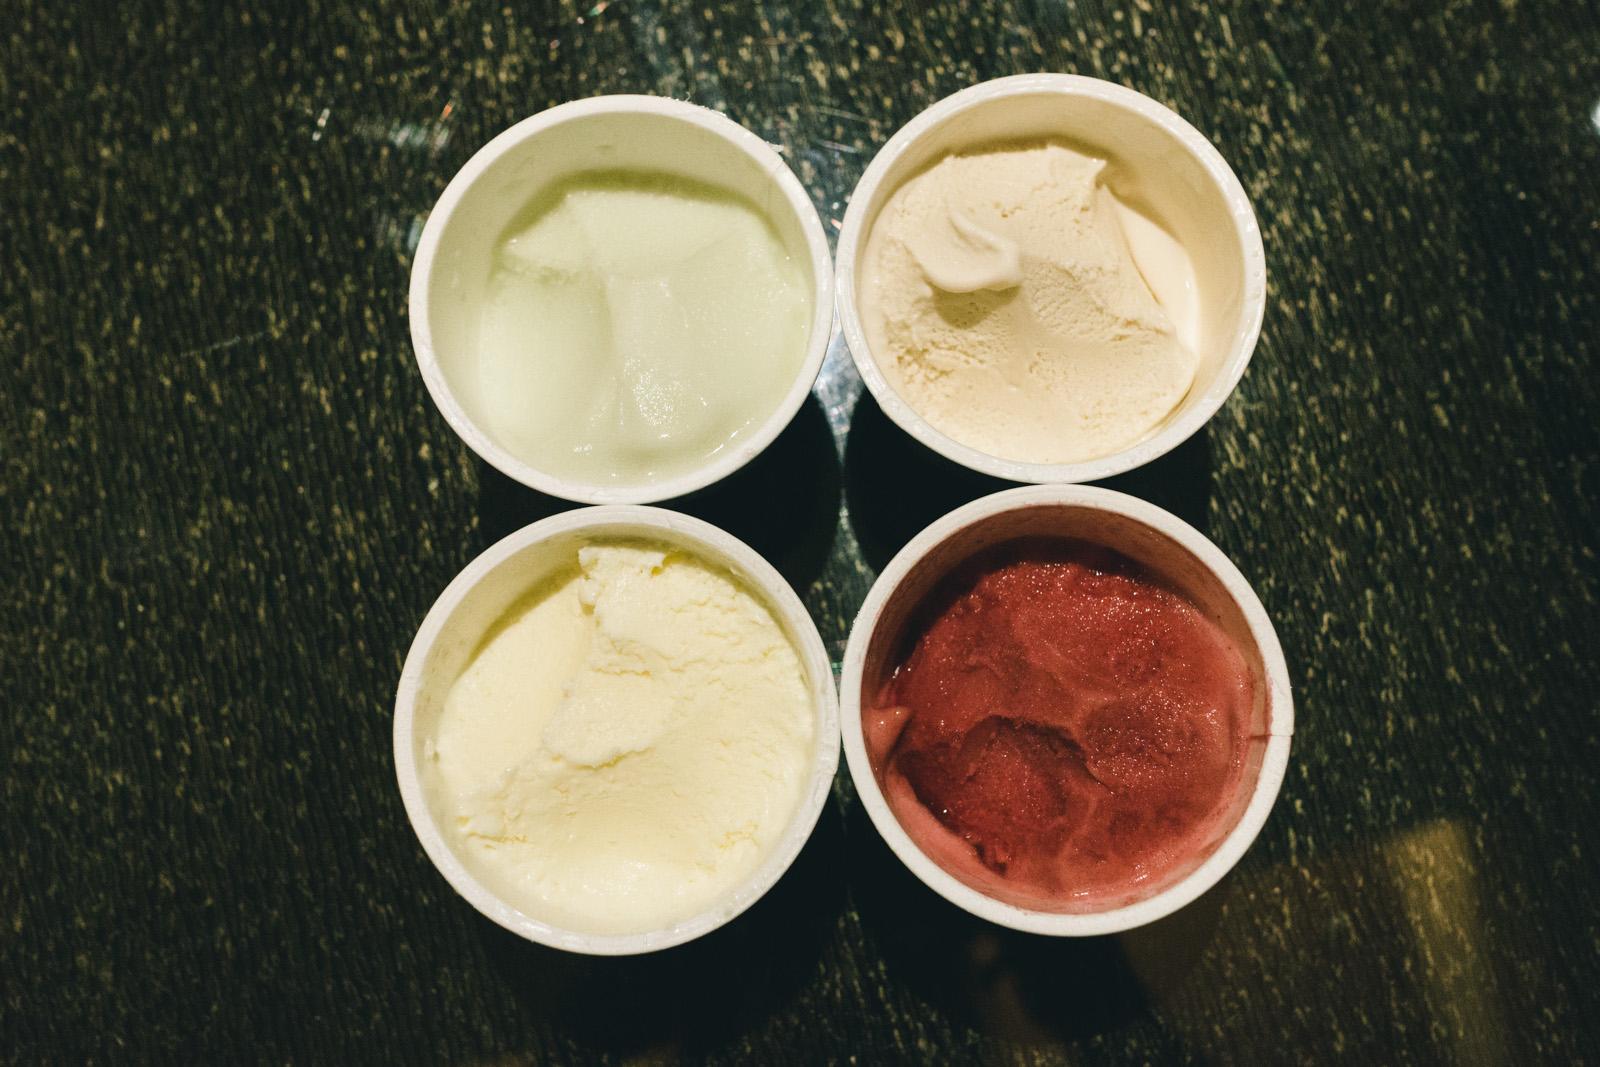 that-food-cray-fruit-parlor-tokyo-japan-semiyaka-ice-cream-10